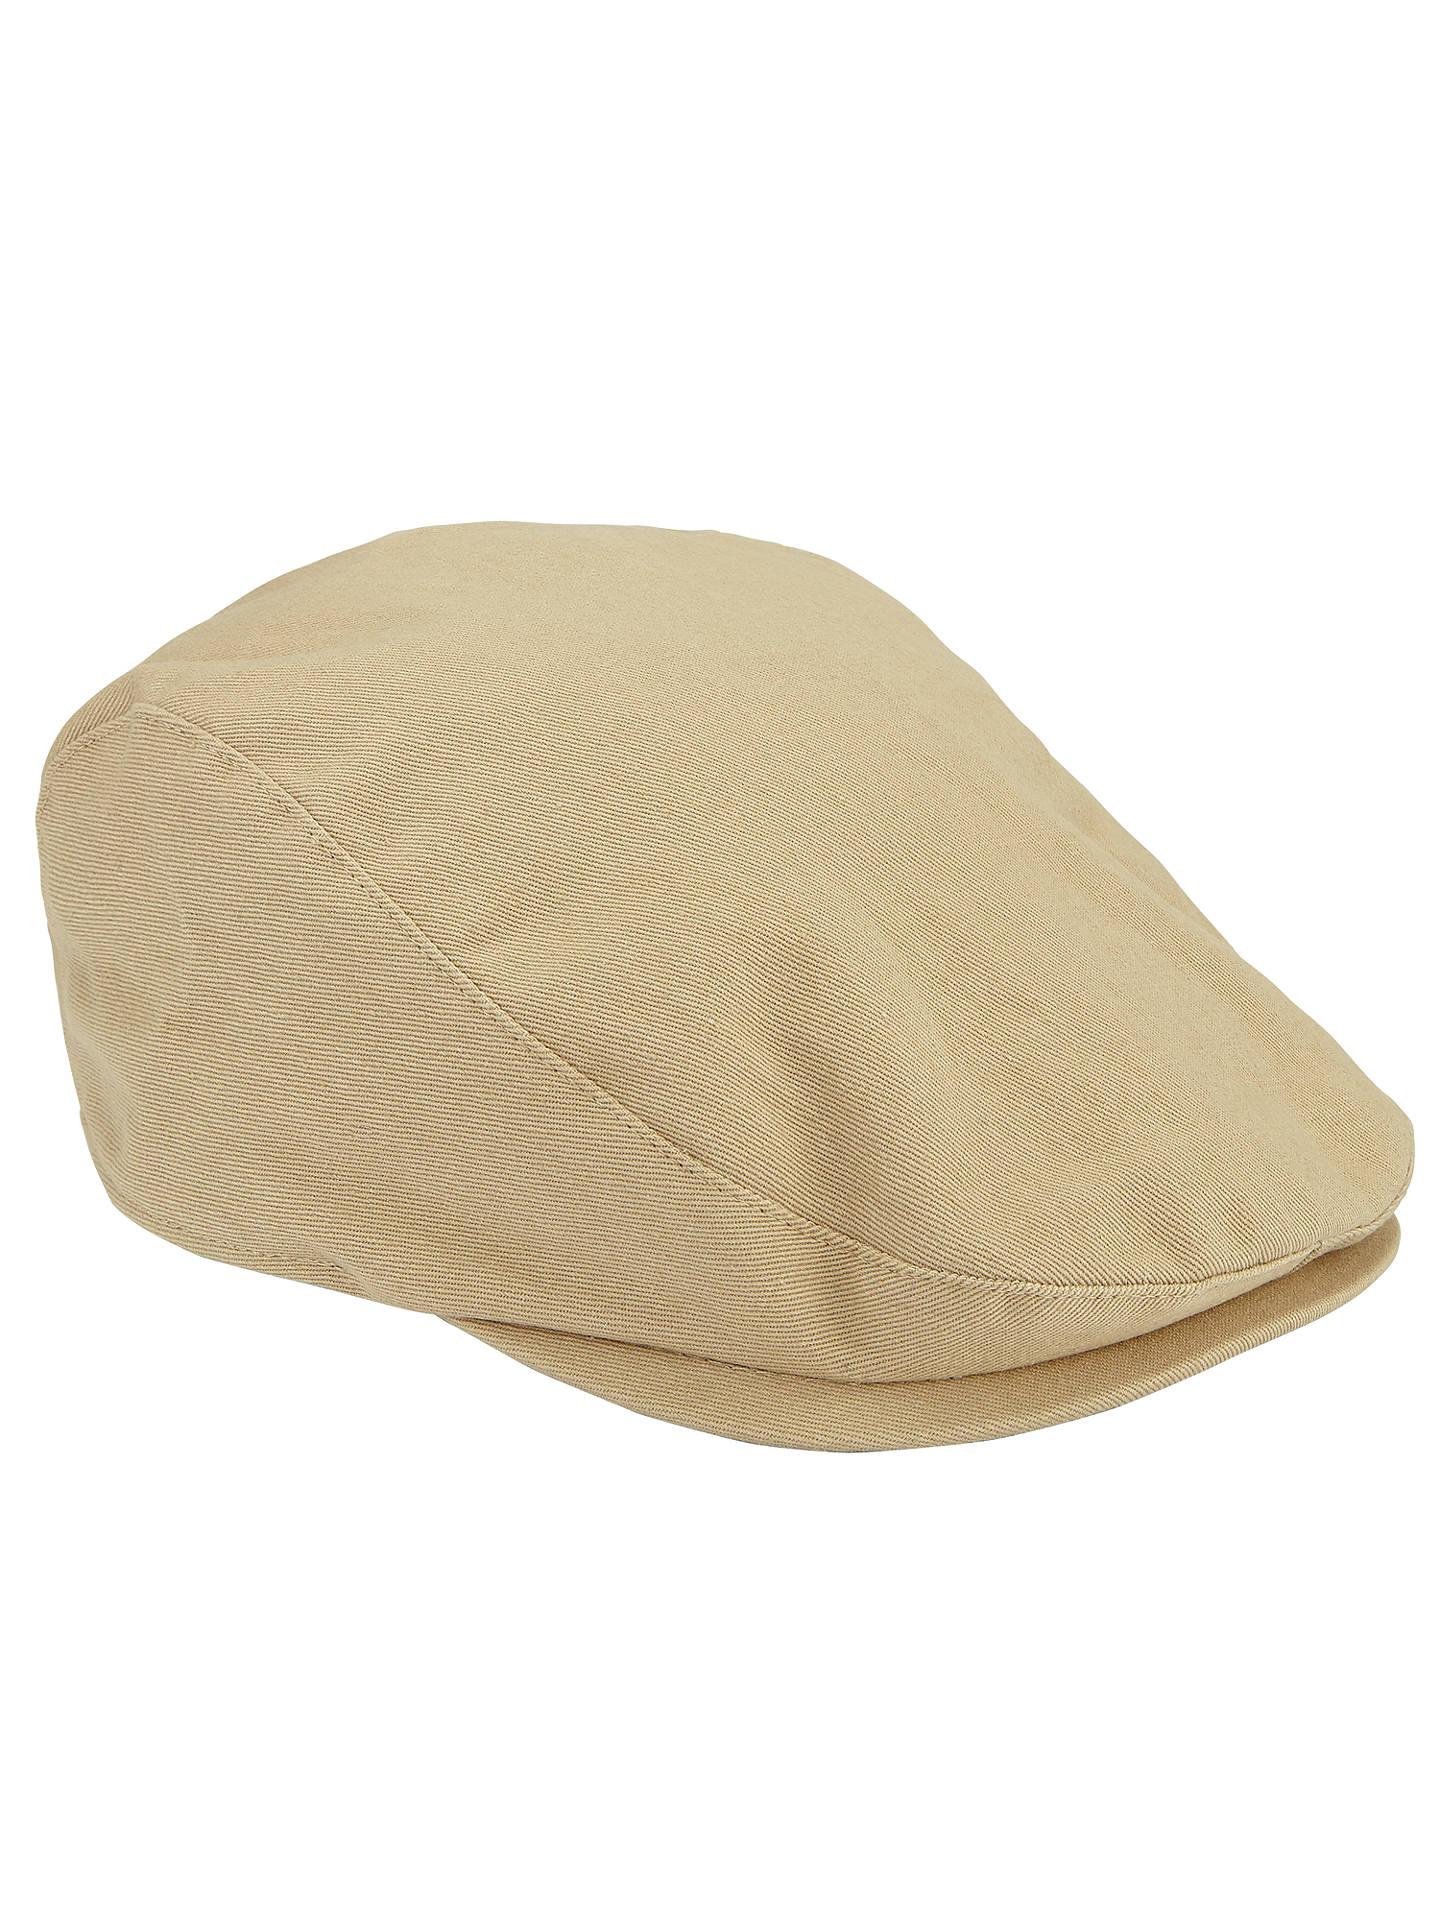 BuyBarbour Finnean Cotton Flat Cap 71d1646b4db